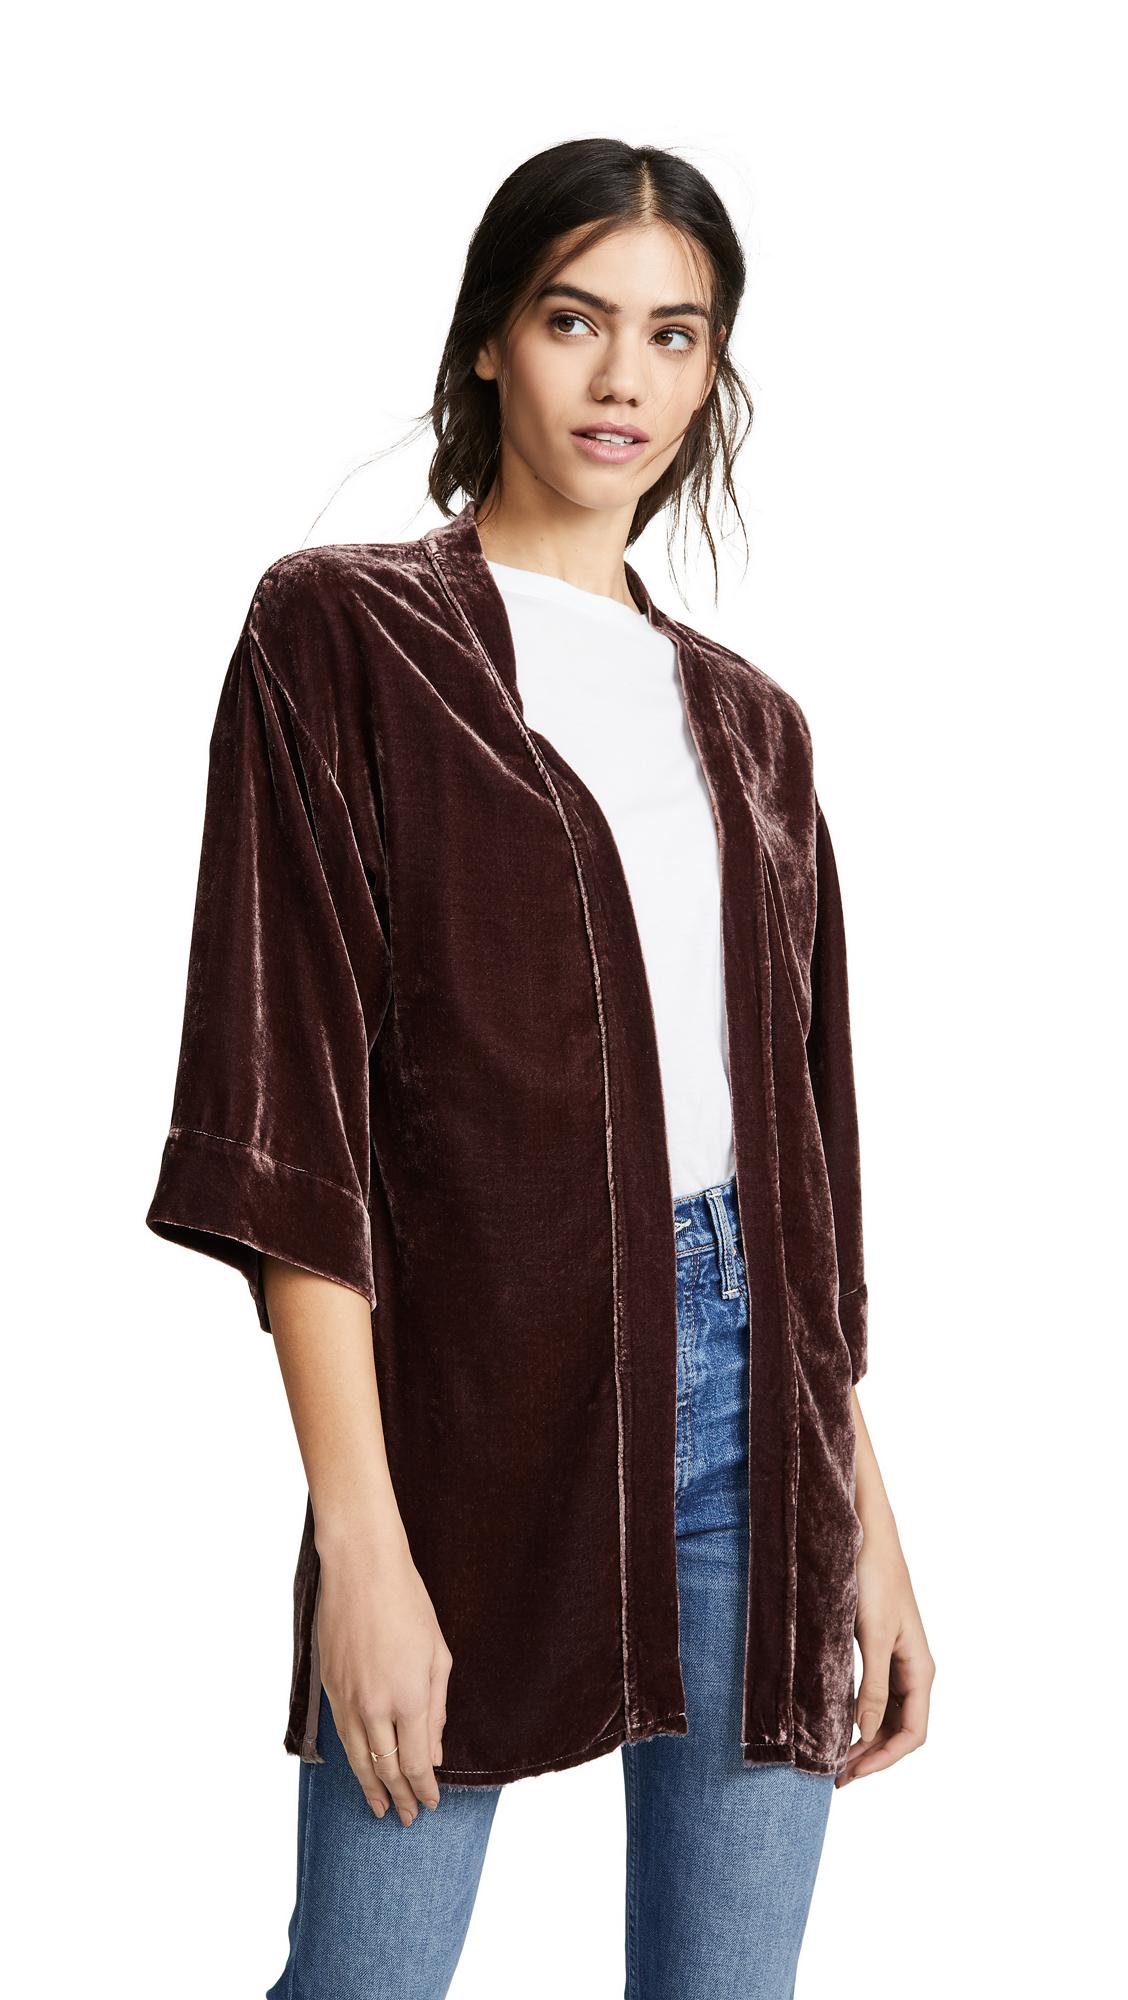 NATION LTD Winslow Velvet Bed Jacket in Concord